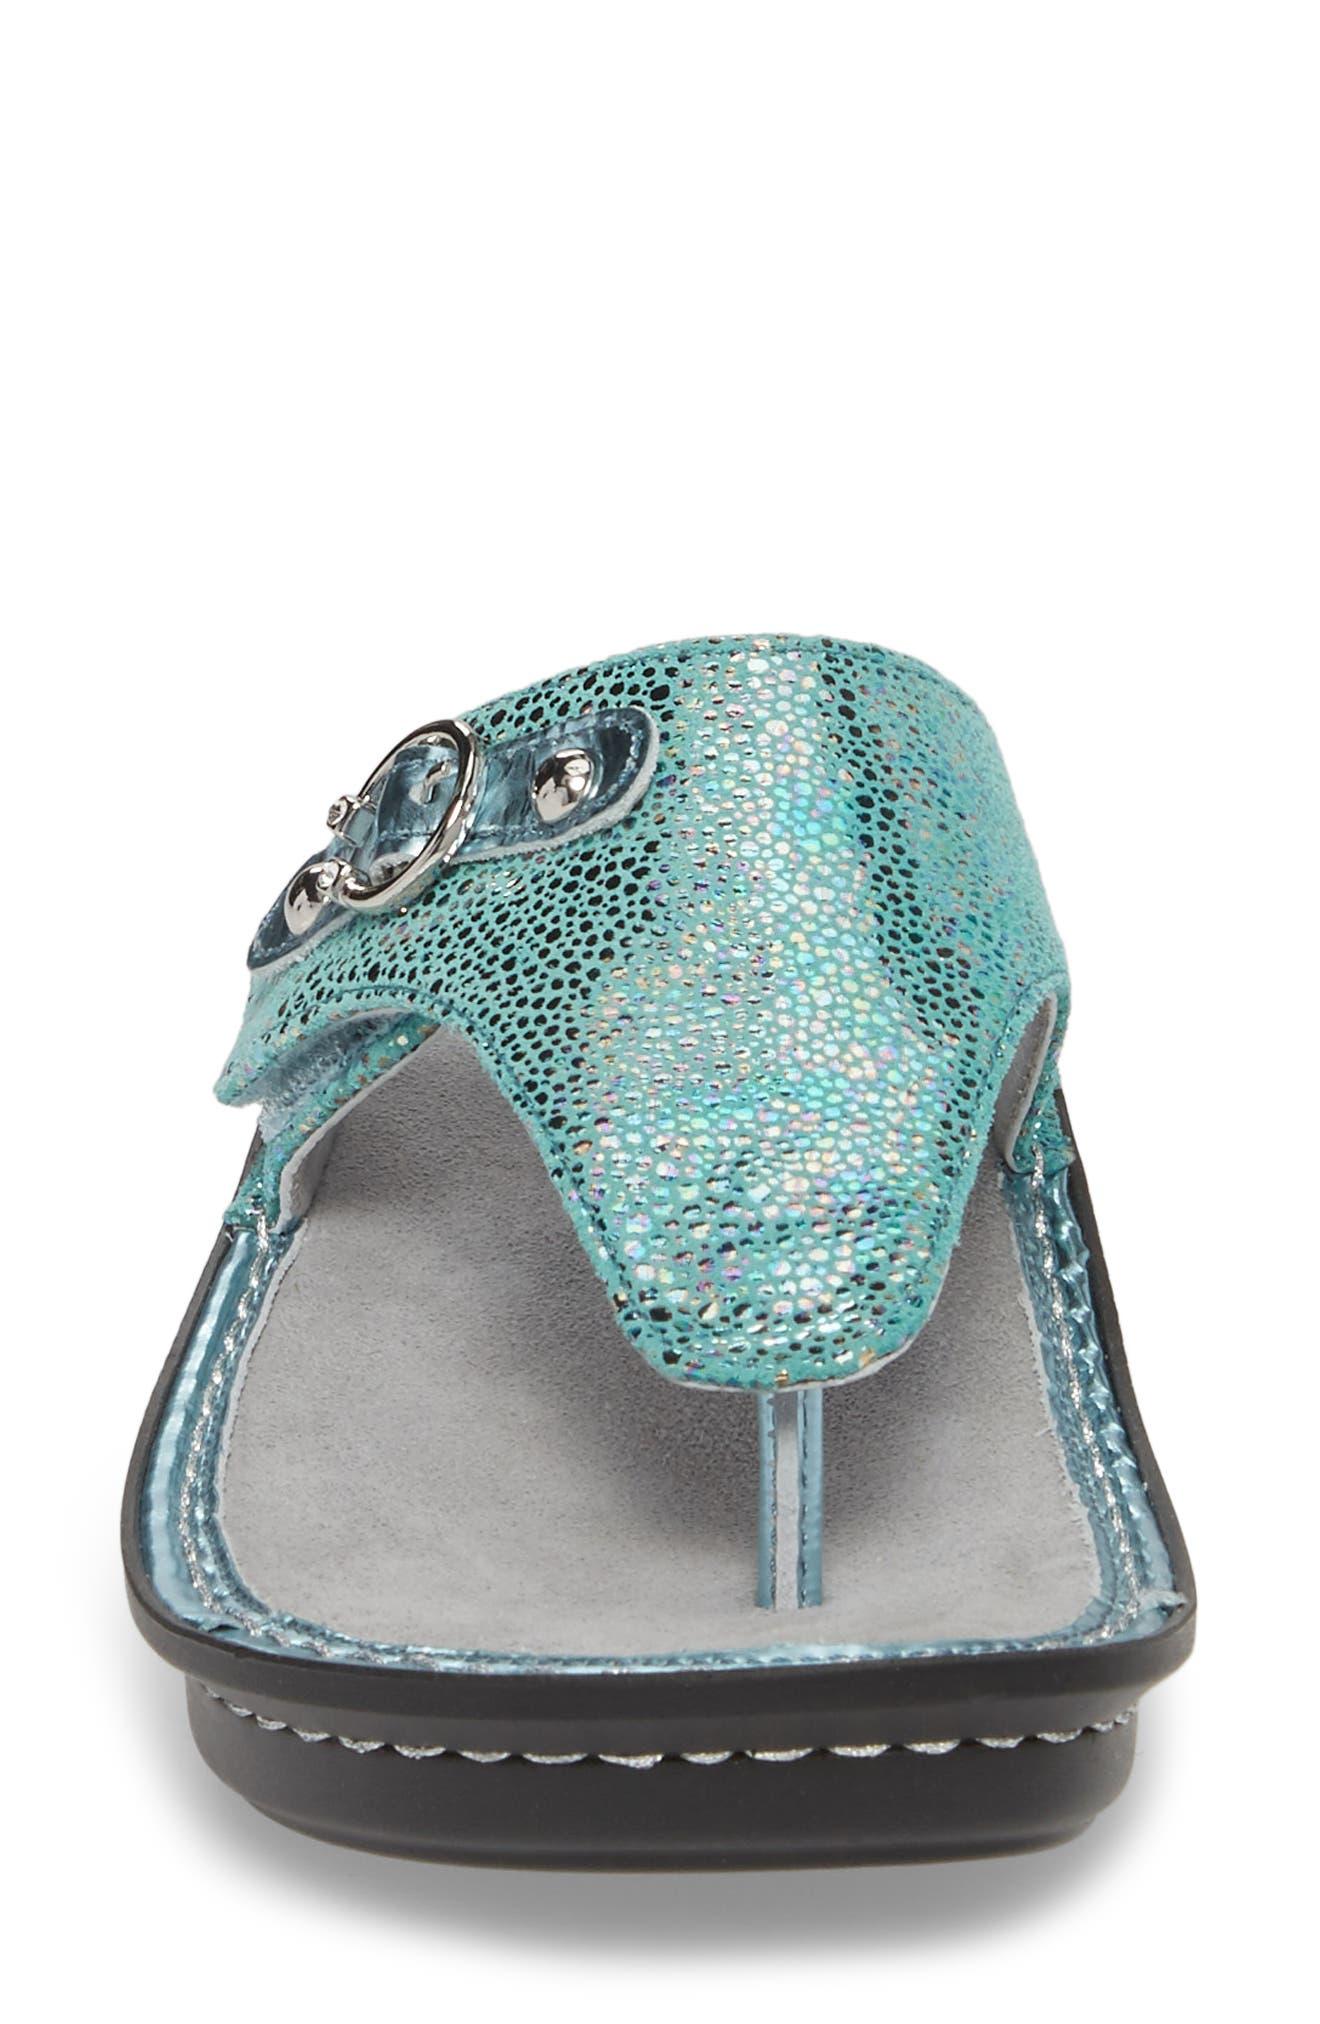 'Vanessa' Thong Sandal,                             Alternate thumbnail 4, color,                             Aqua Love Leather